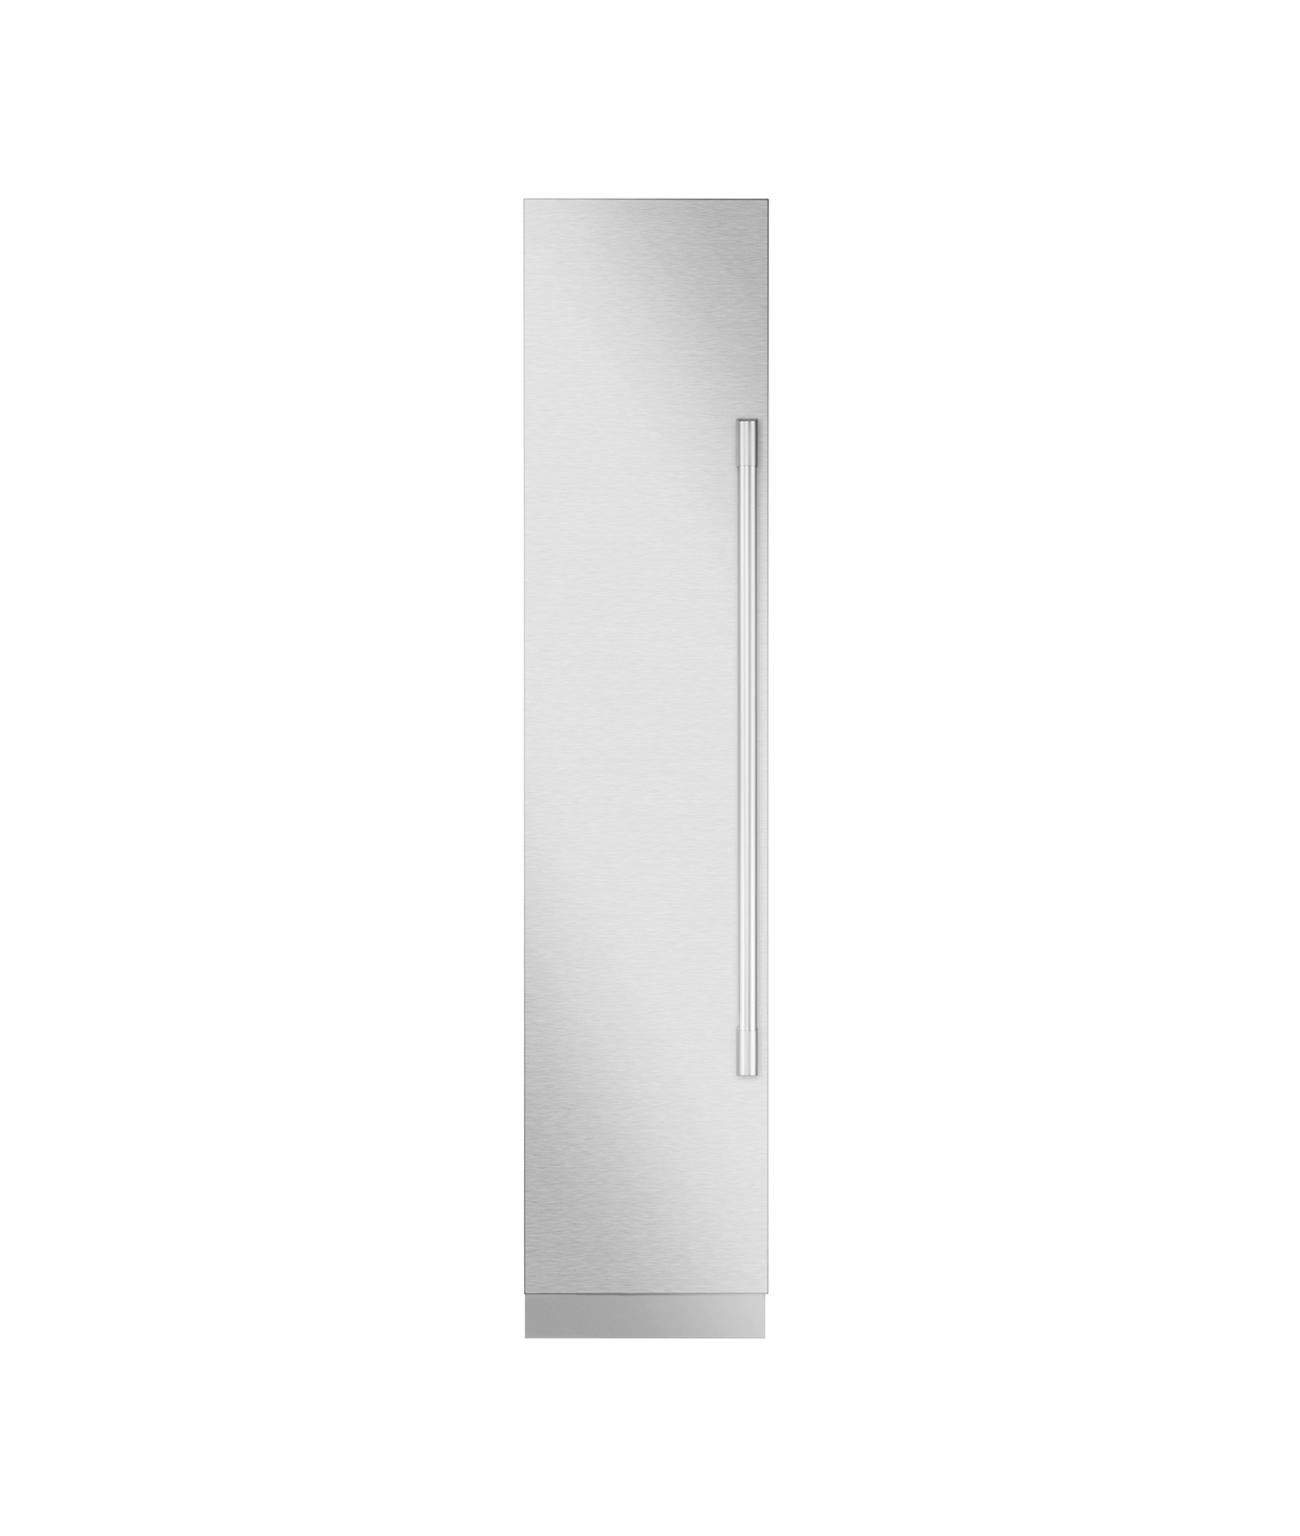 "18"" Integrated Column Freezer"